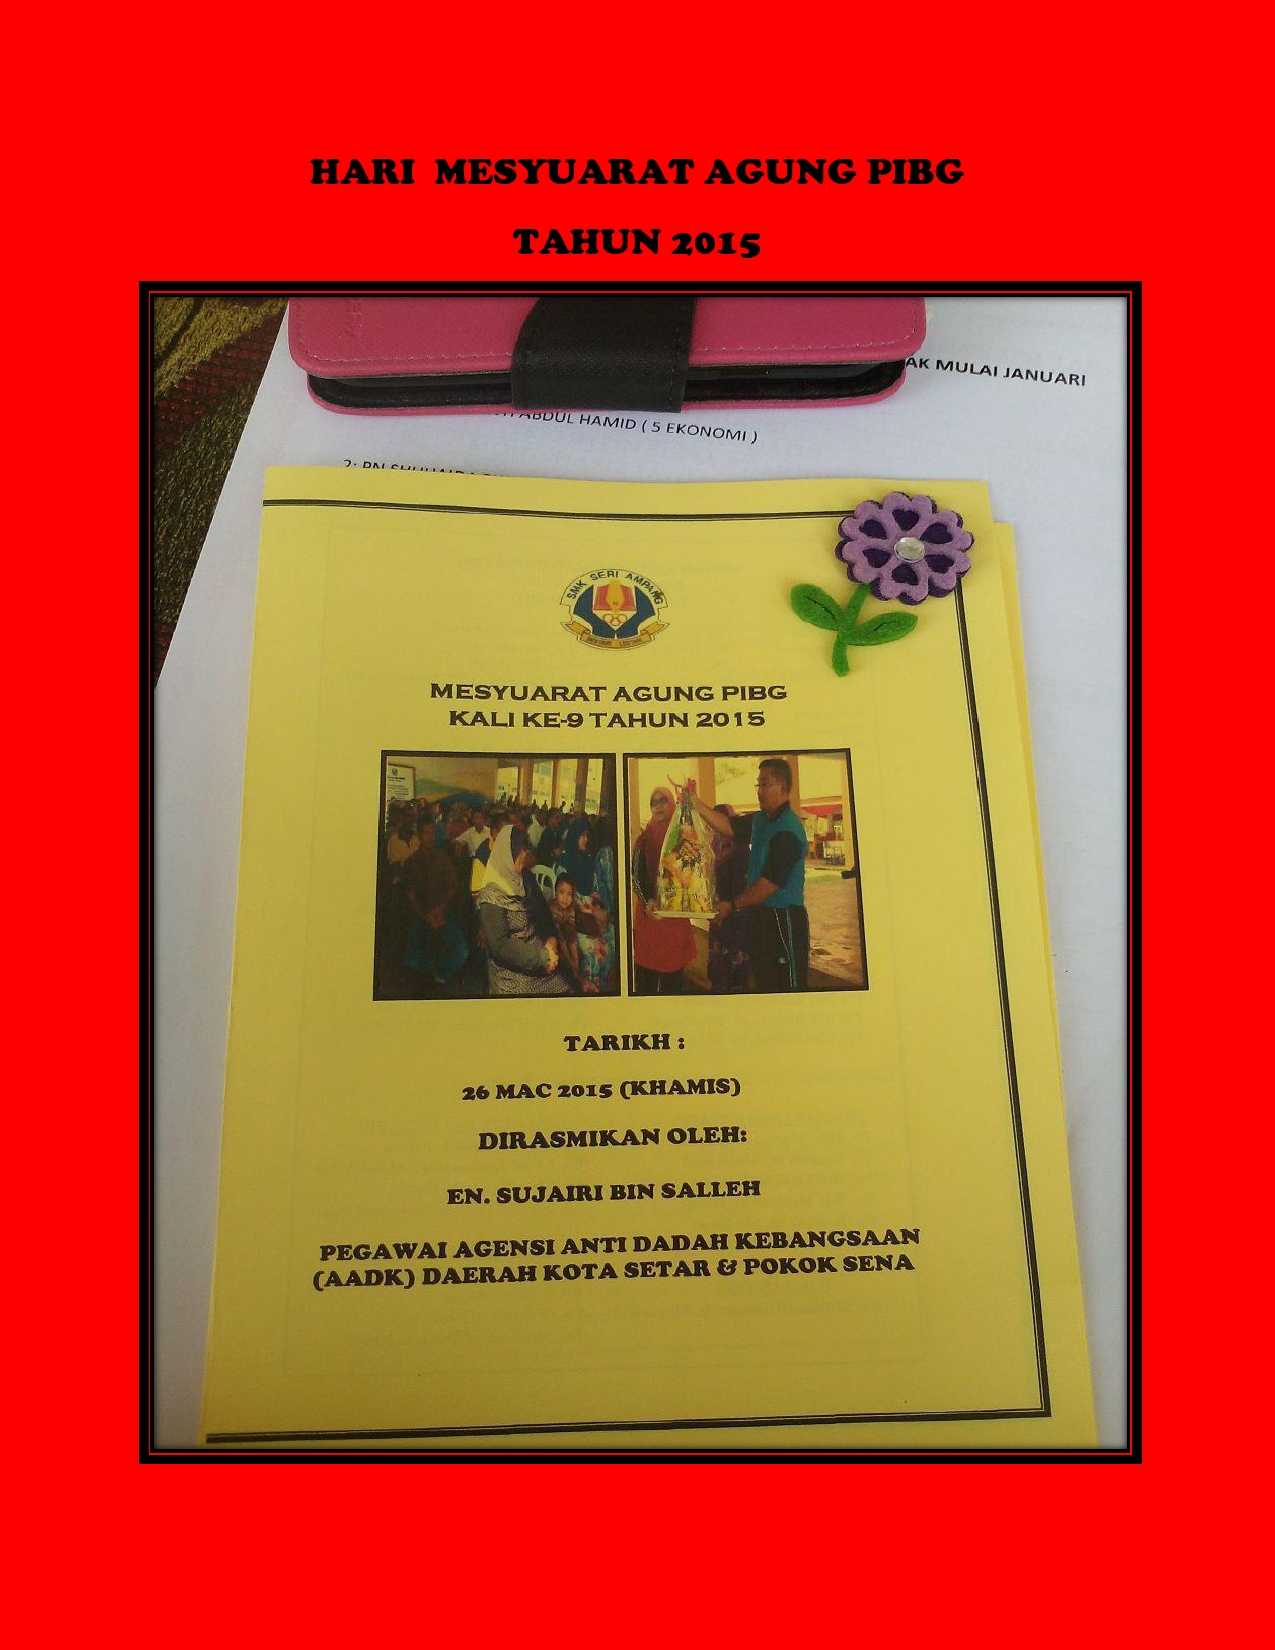 PICHARI  MESYUARAT AGUNG PIBG (2)-page0001